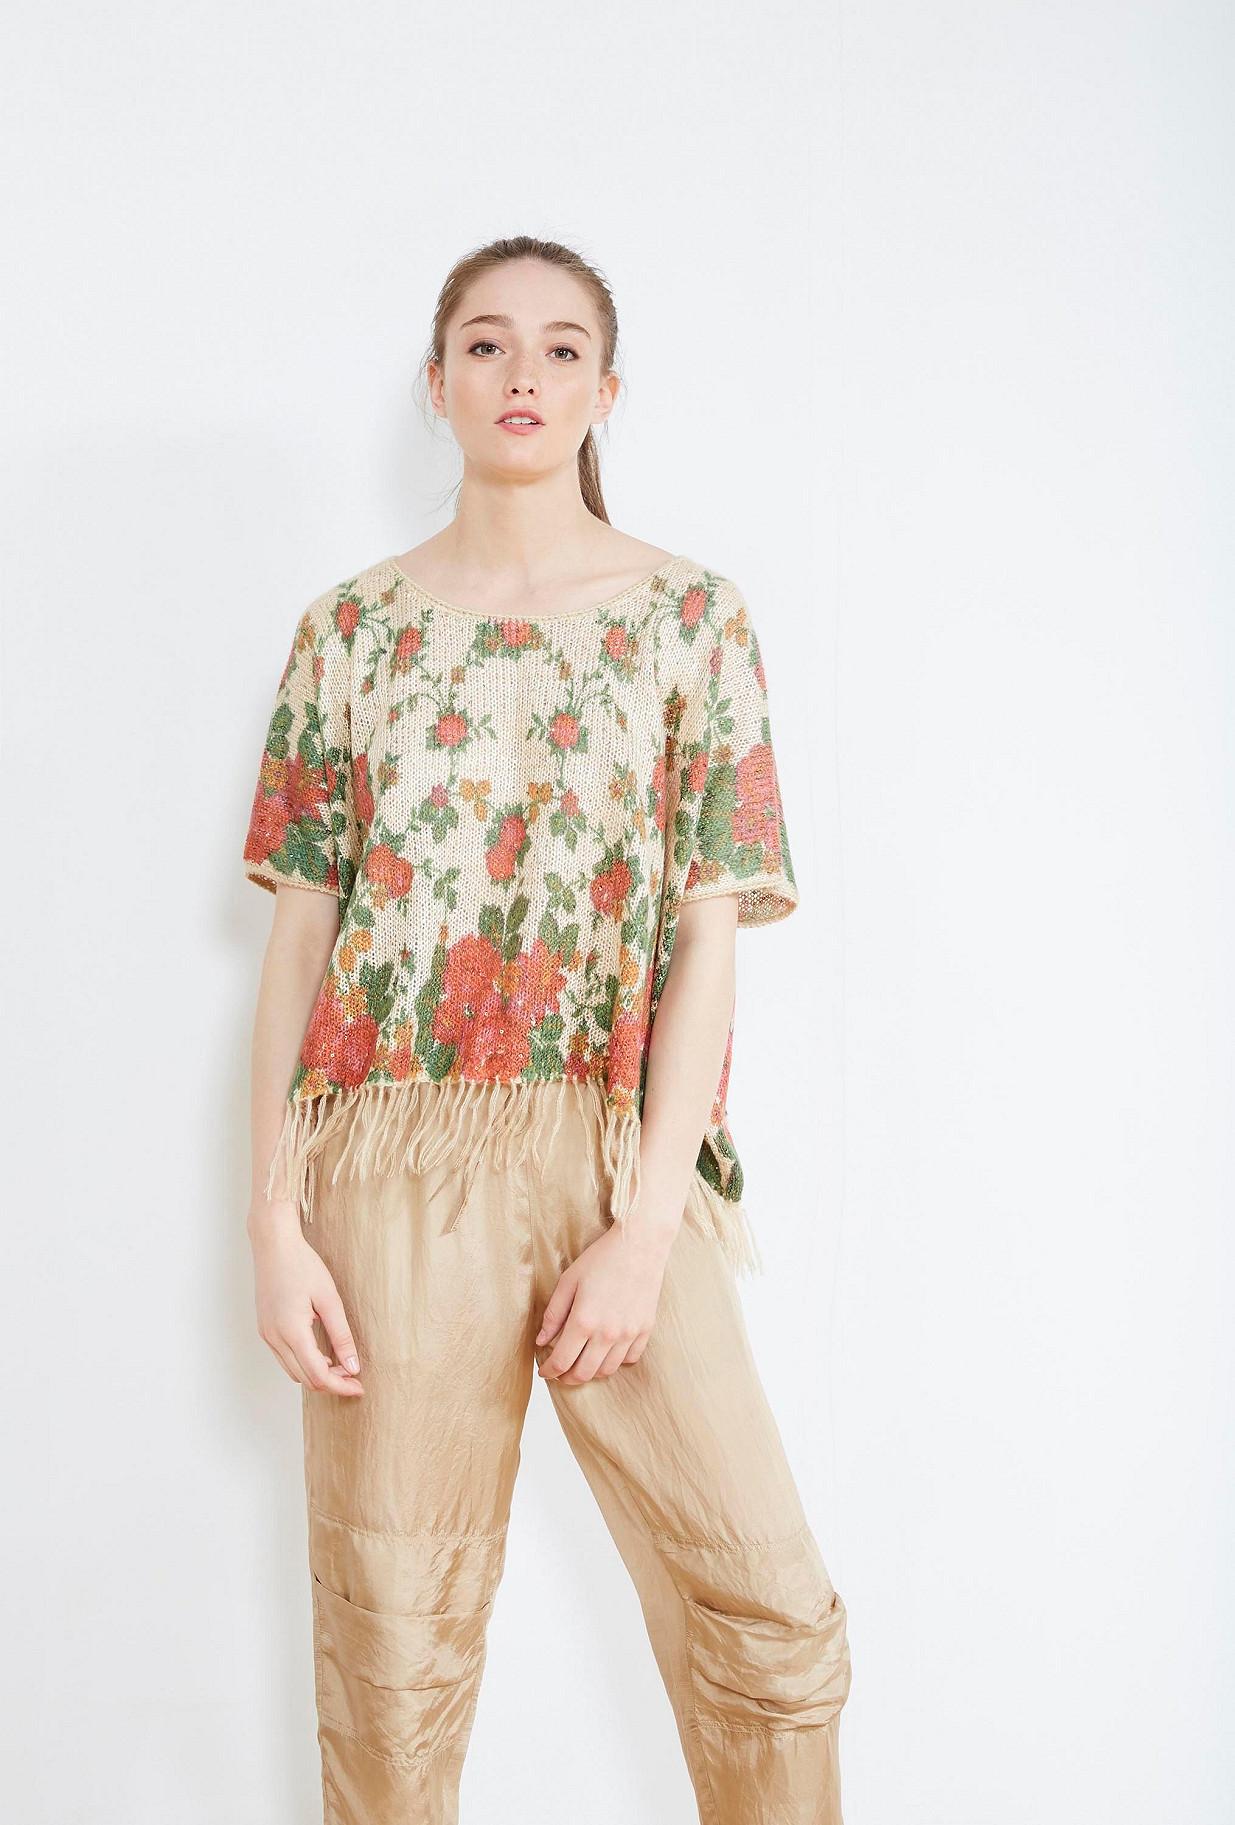 clothes store PONCHO  Macha french designer fashion Paris